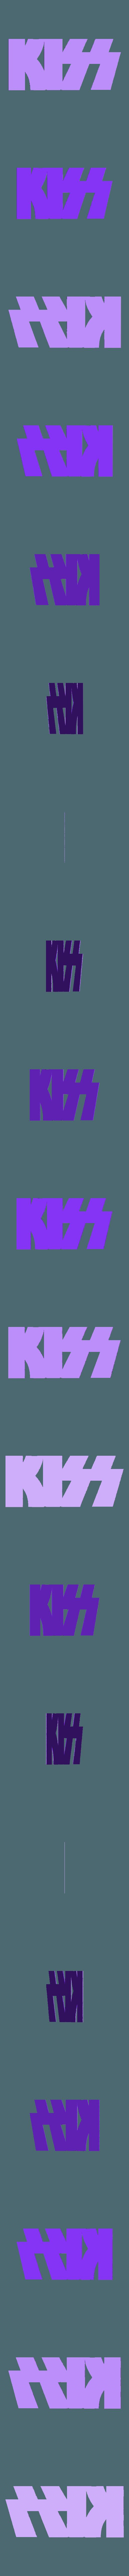 kiss_1.stl Download free STL file Logo kiss • 3D print object, 3dlito